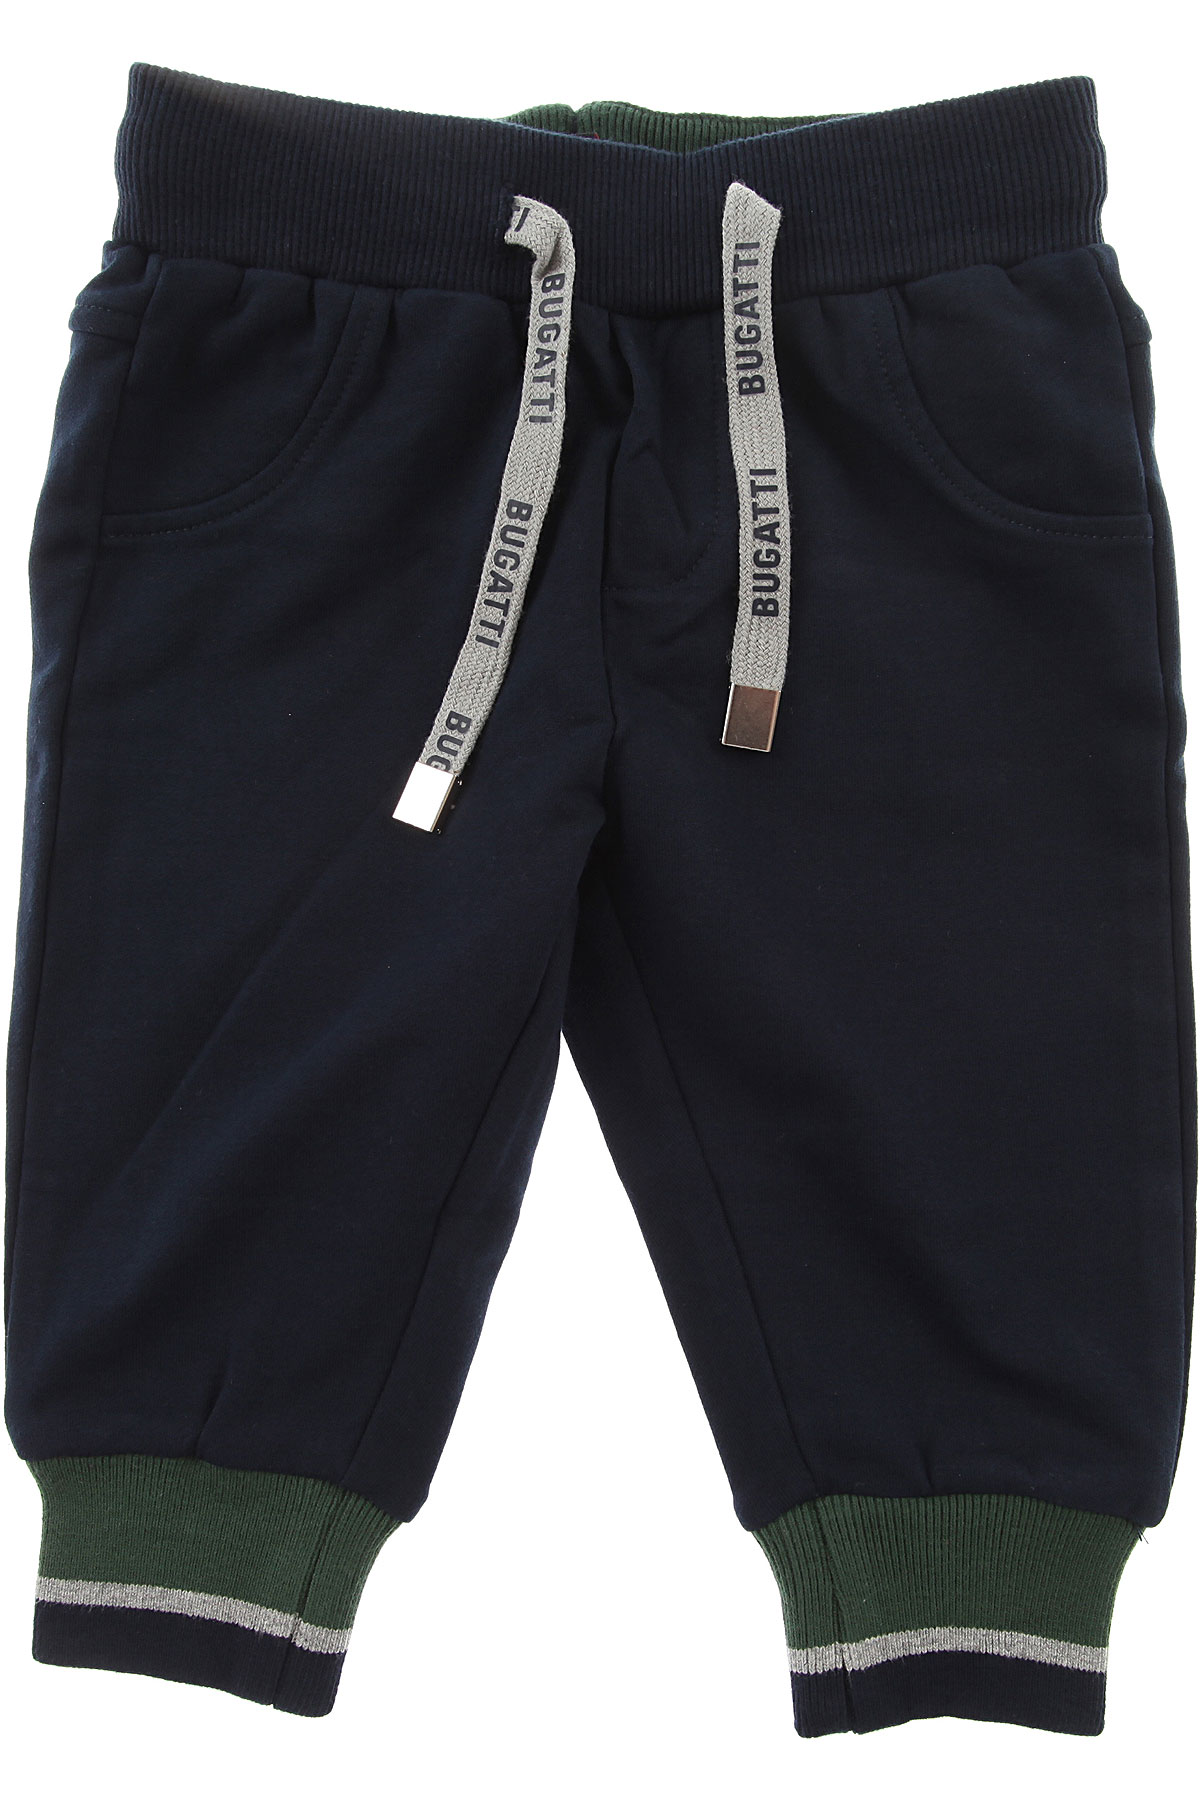 Image of Bugatti Baby Pants for Boys, Blue, Cotton, 2017, 12M 18M 6M 9M